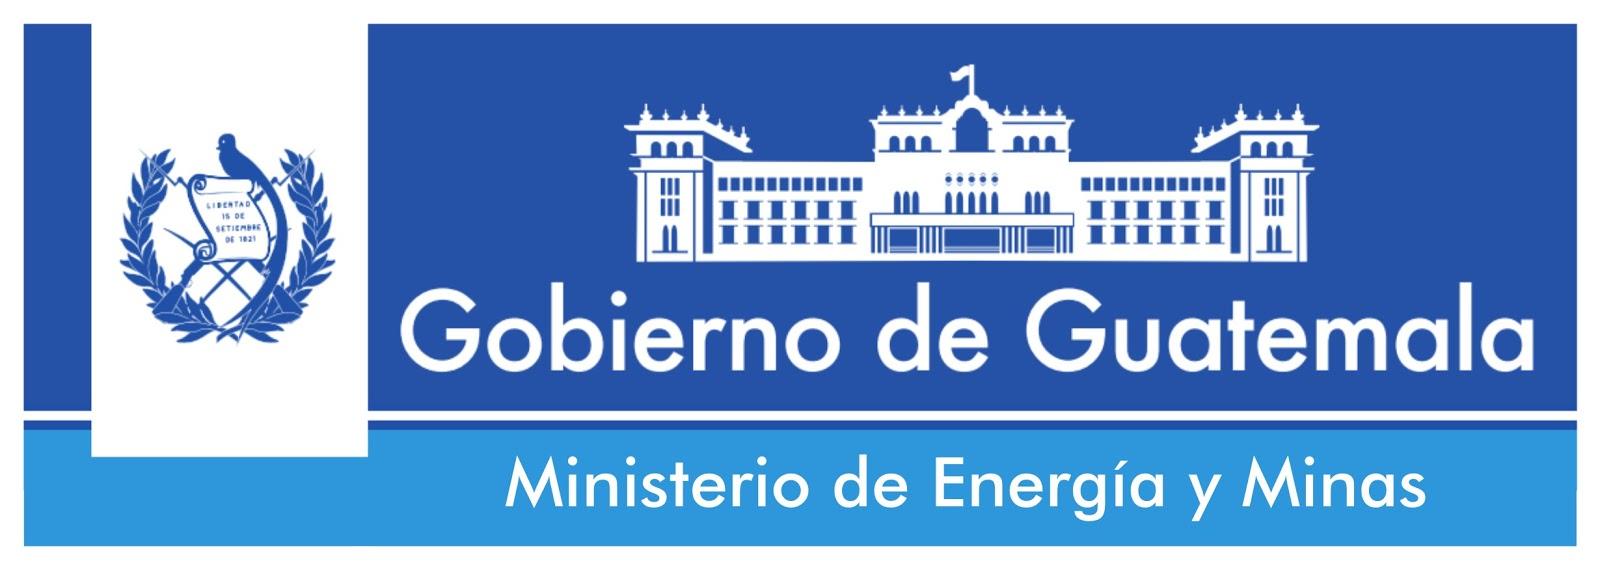 2016 matriz energ tica en guatemala for Ministerio de consumo